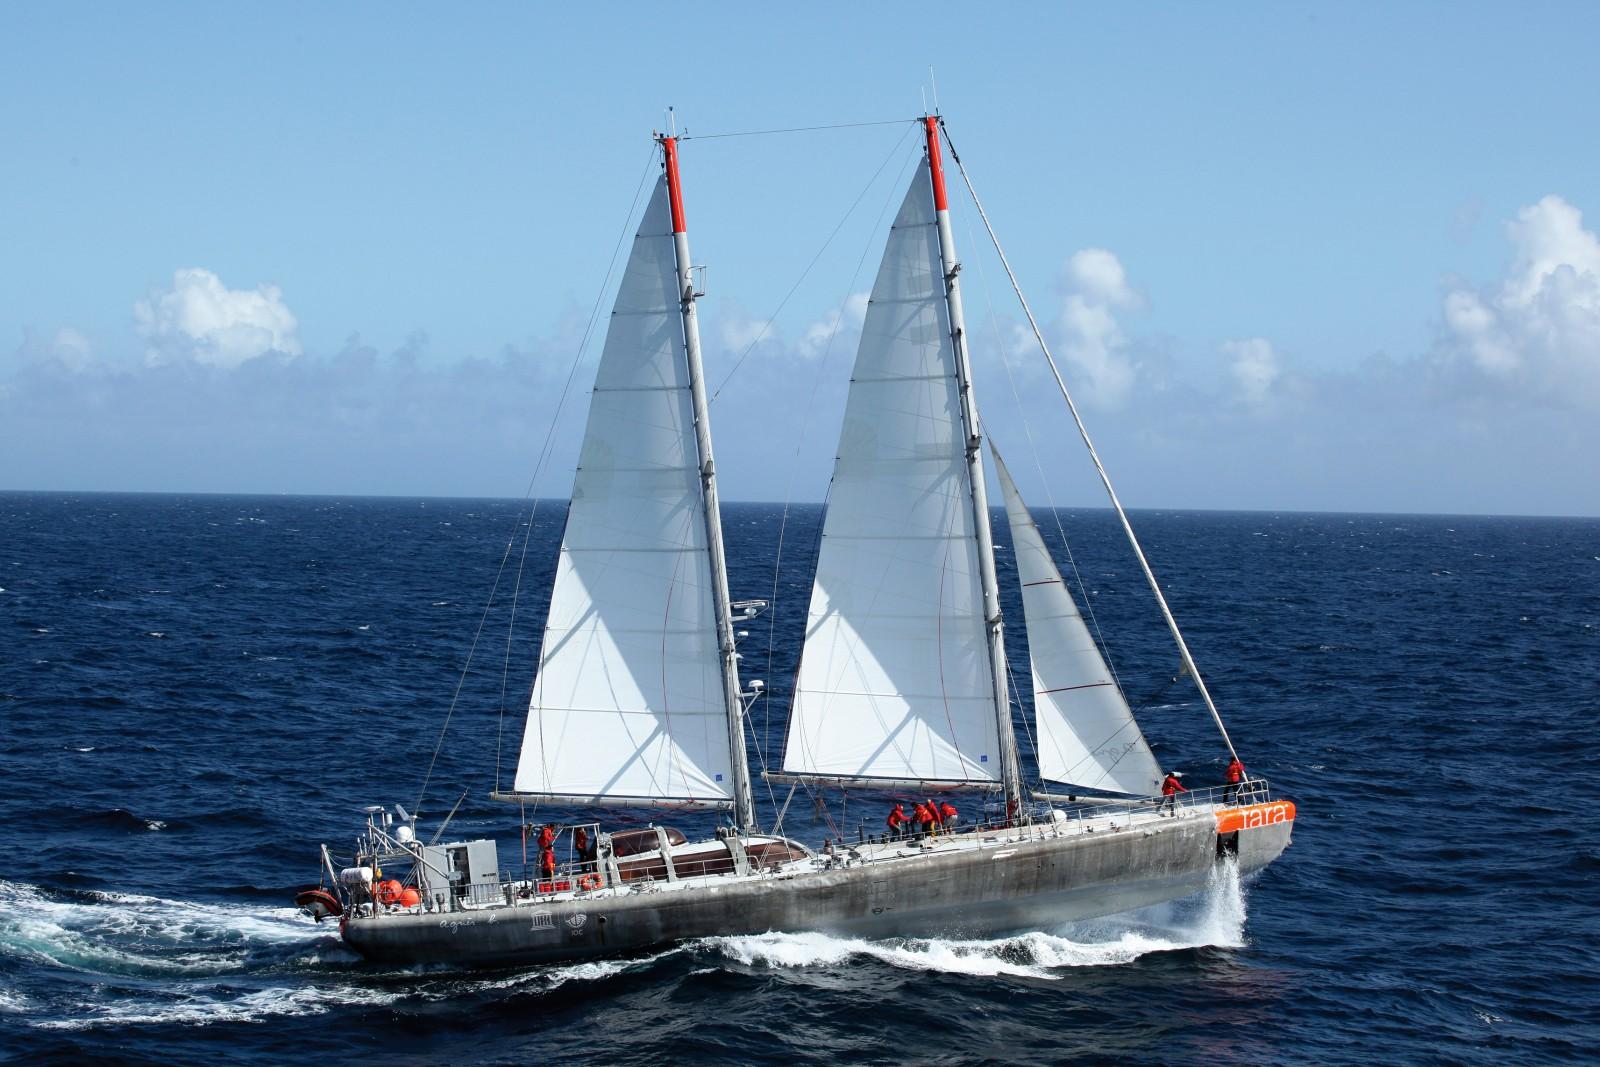 S/Y Tara under full sail. PHOTO/COPYRIGHT 2016 TARA EXPEDITIONS